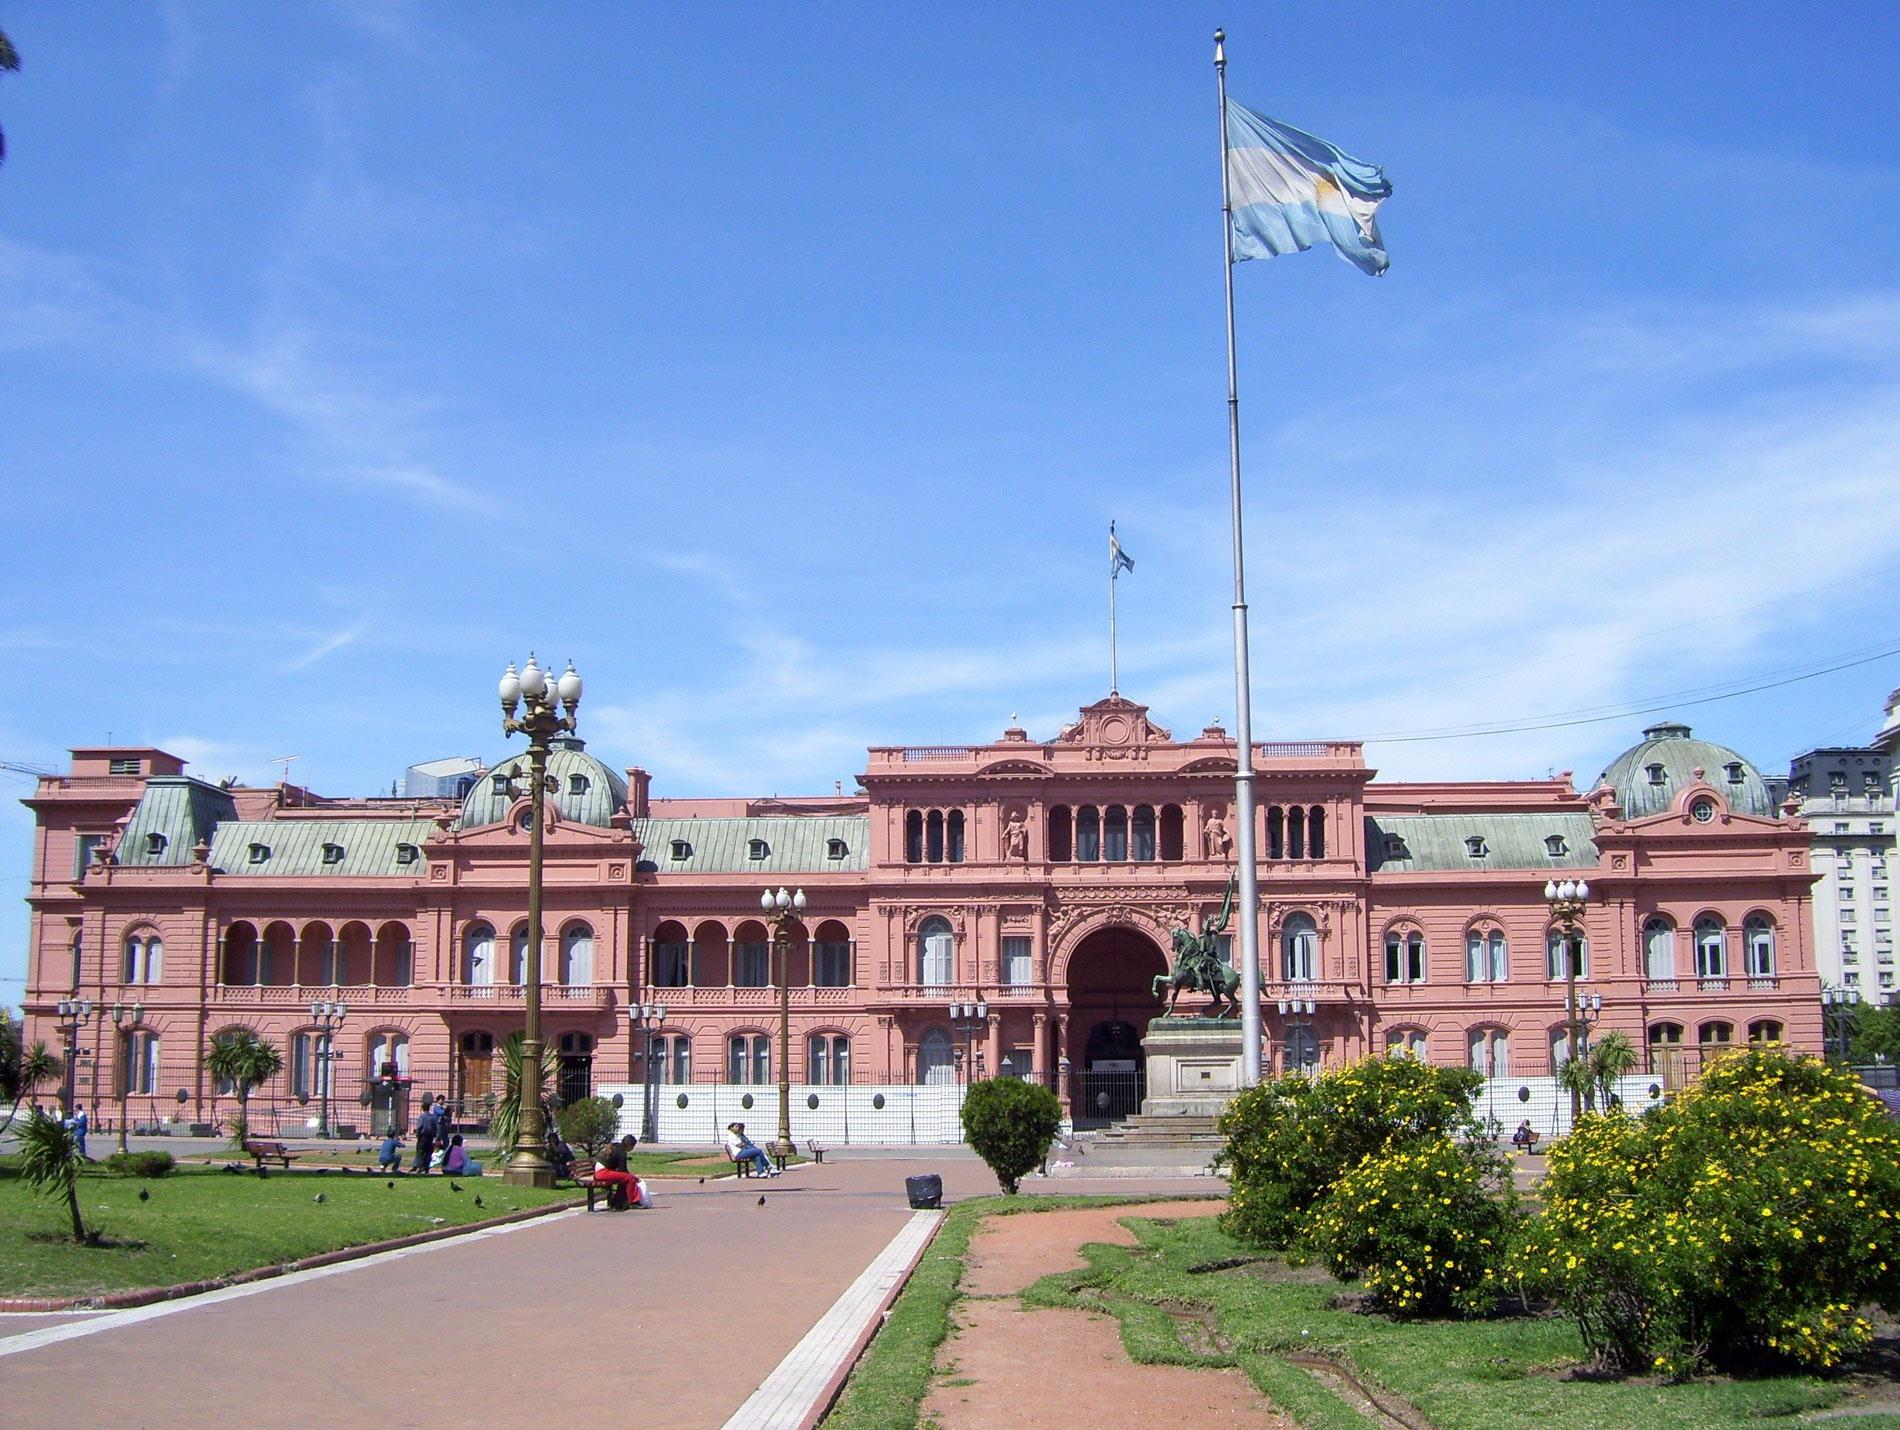 Viaggio in argentina fai da te buenos aires